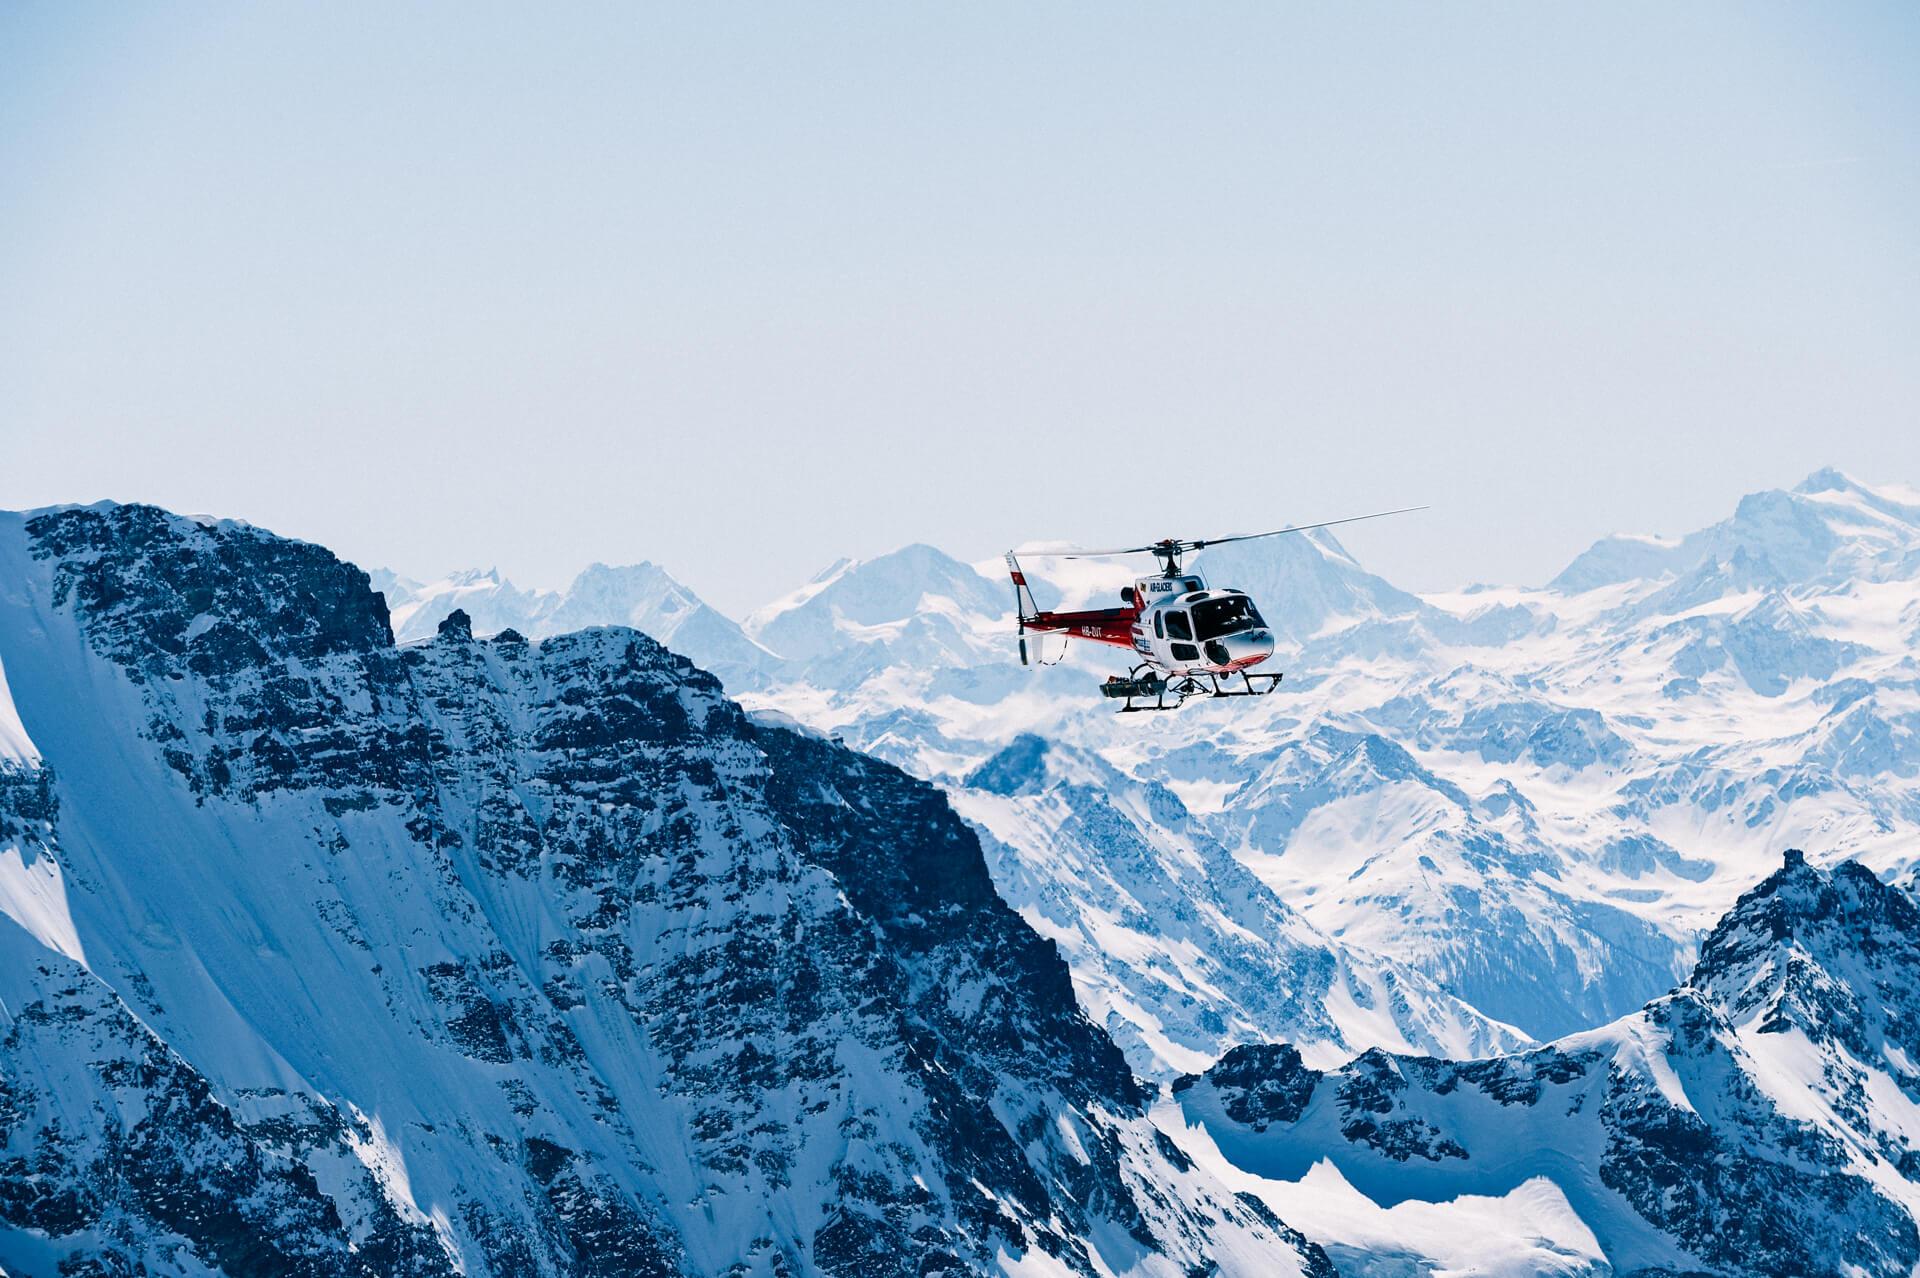 30 min Switzerland Scenic Helicopter Flight over the Jungfrau Region